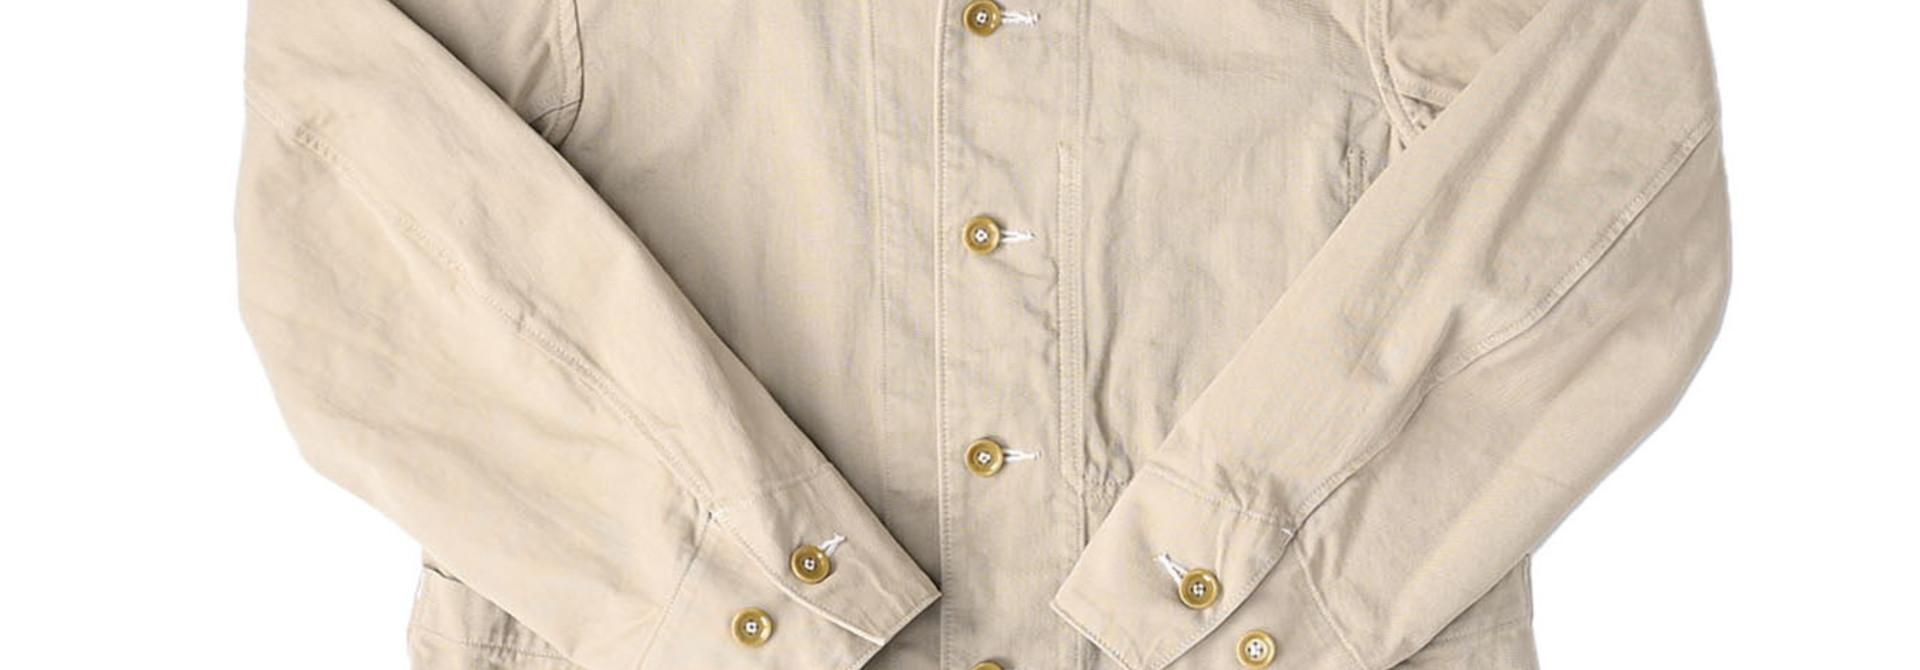 Okome Chino 908 Shirt Jacket